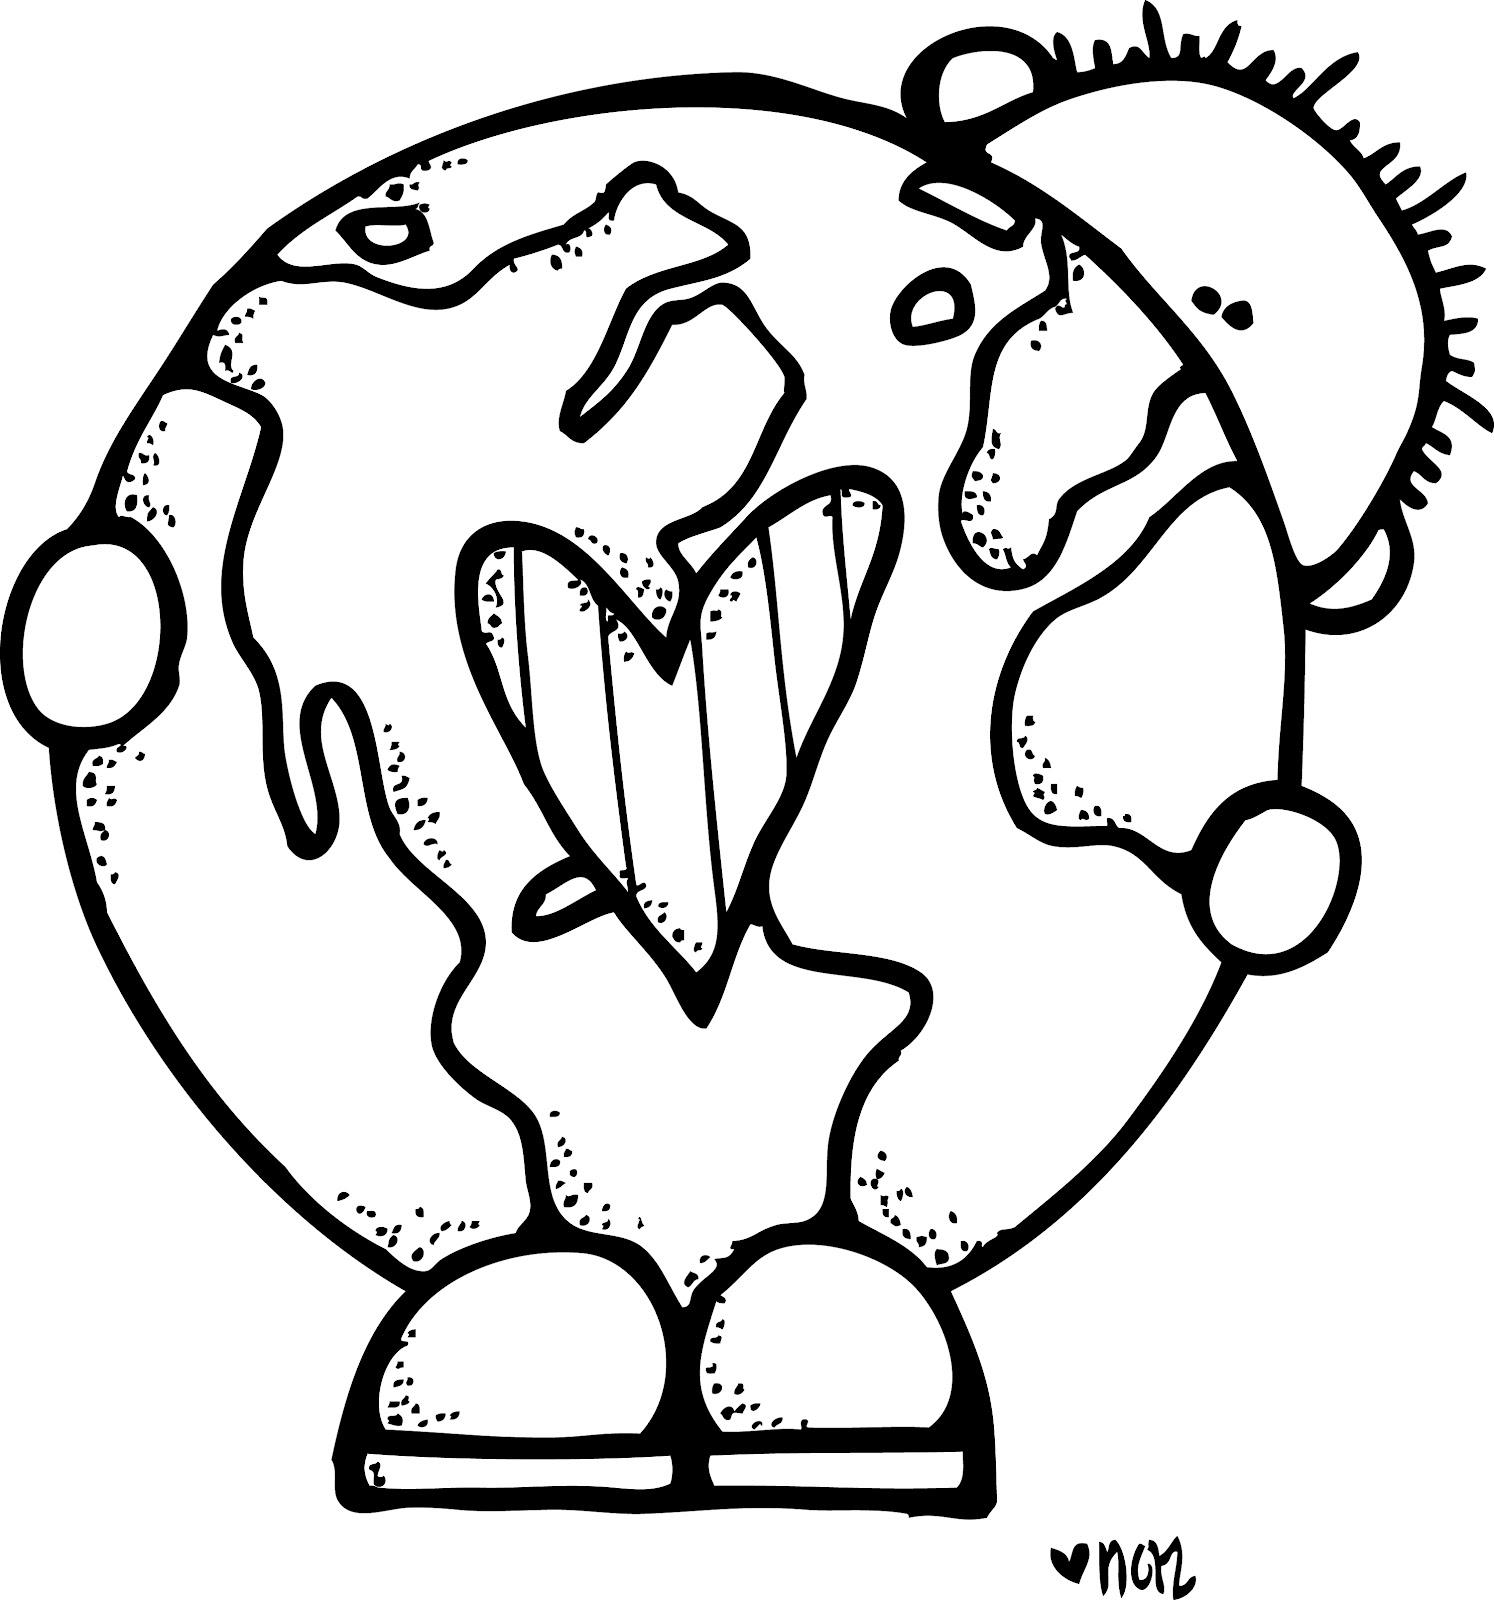 Earth day clipartpedia . April clipart black and white